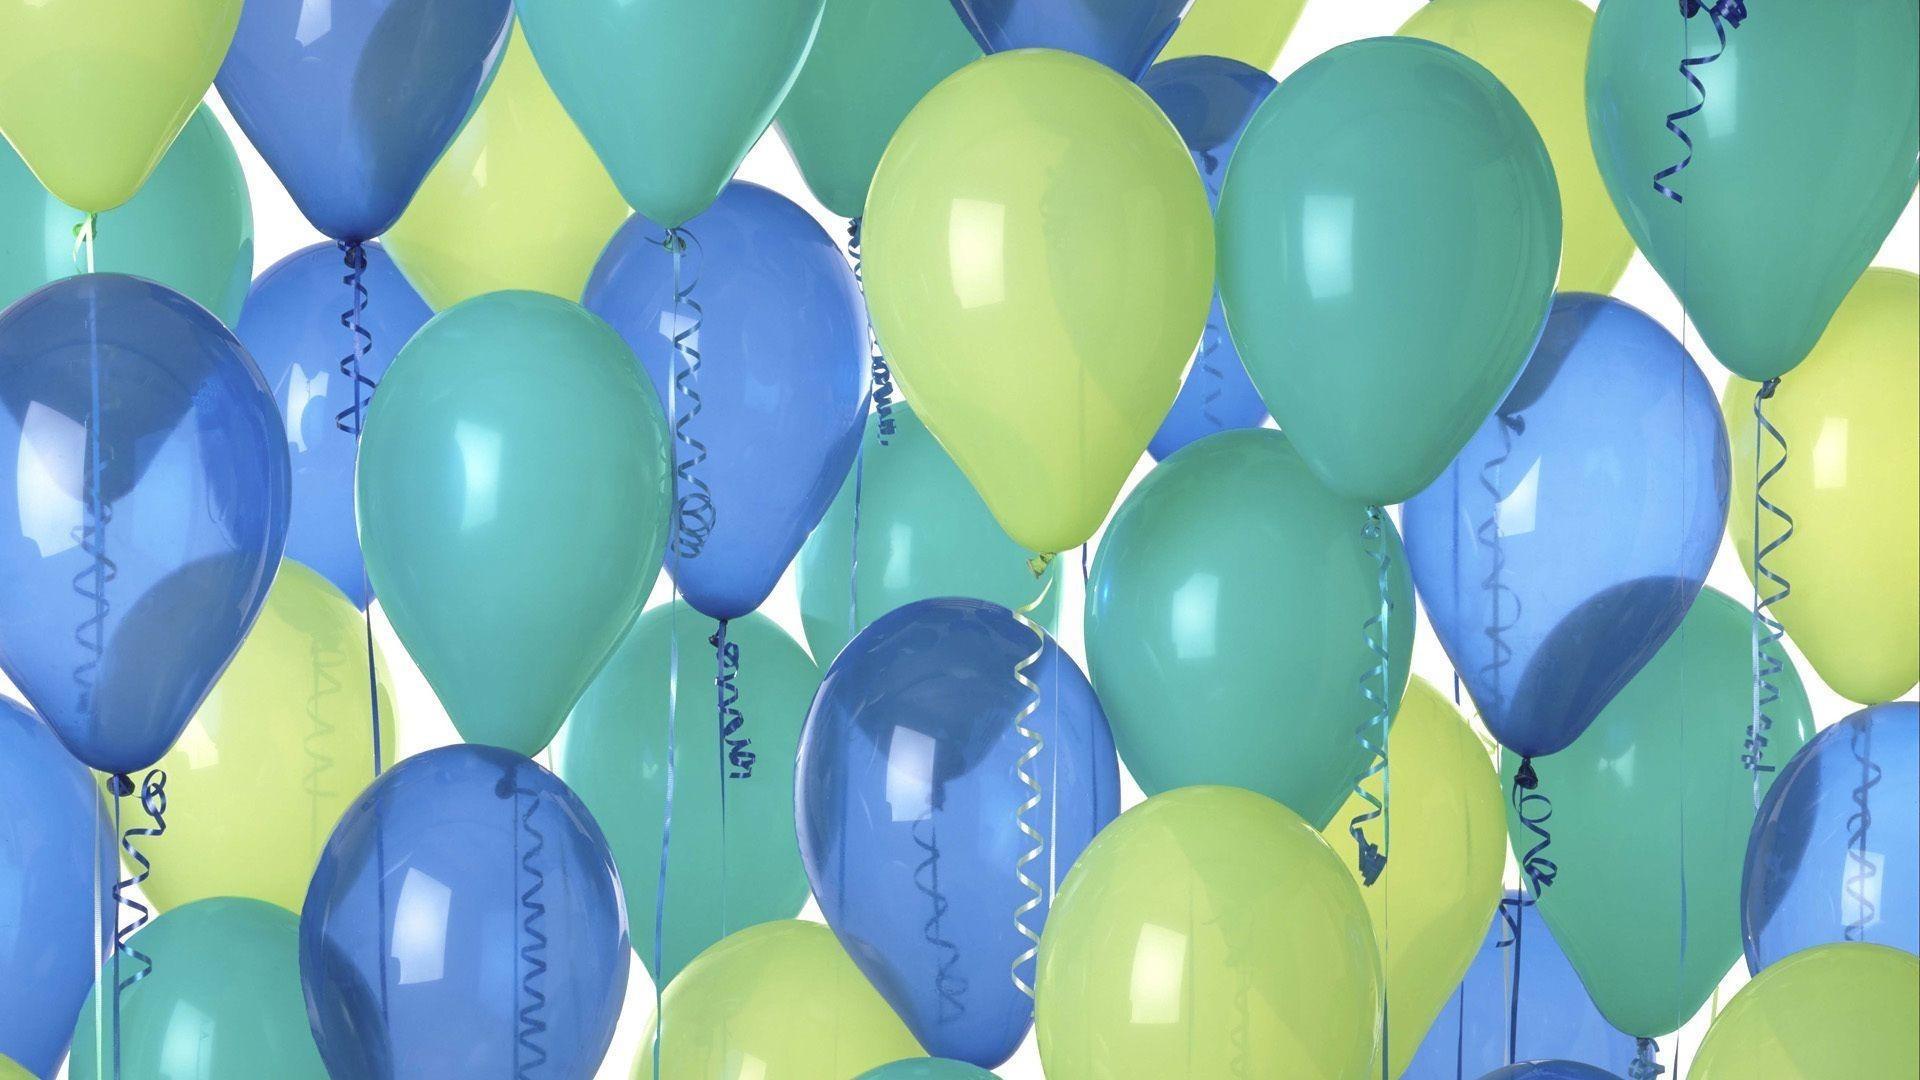 Balloon Background Wallpaper